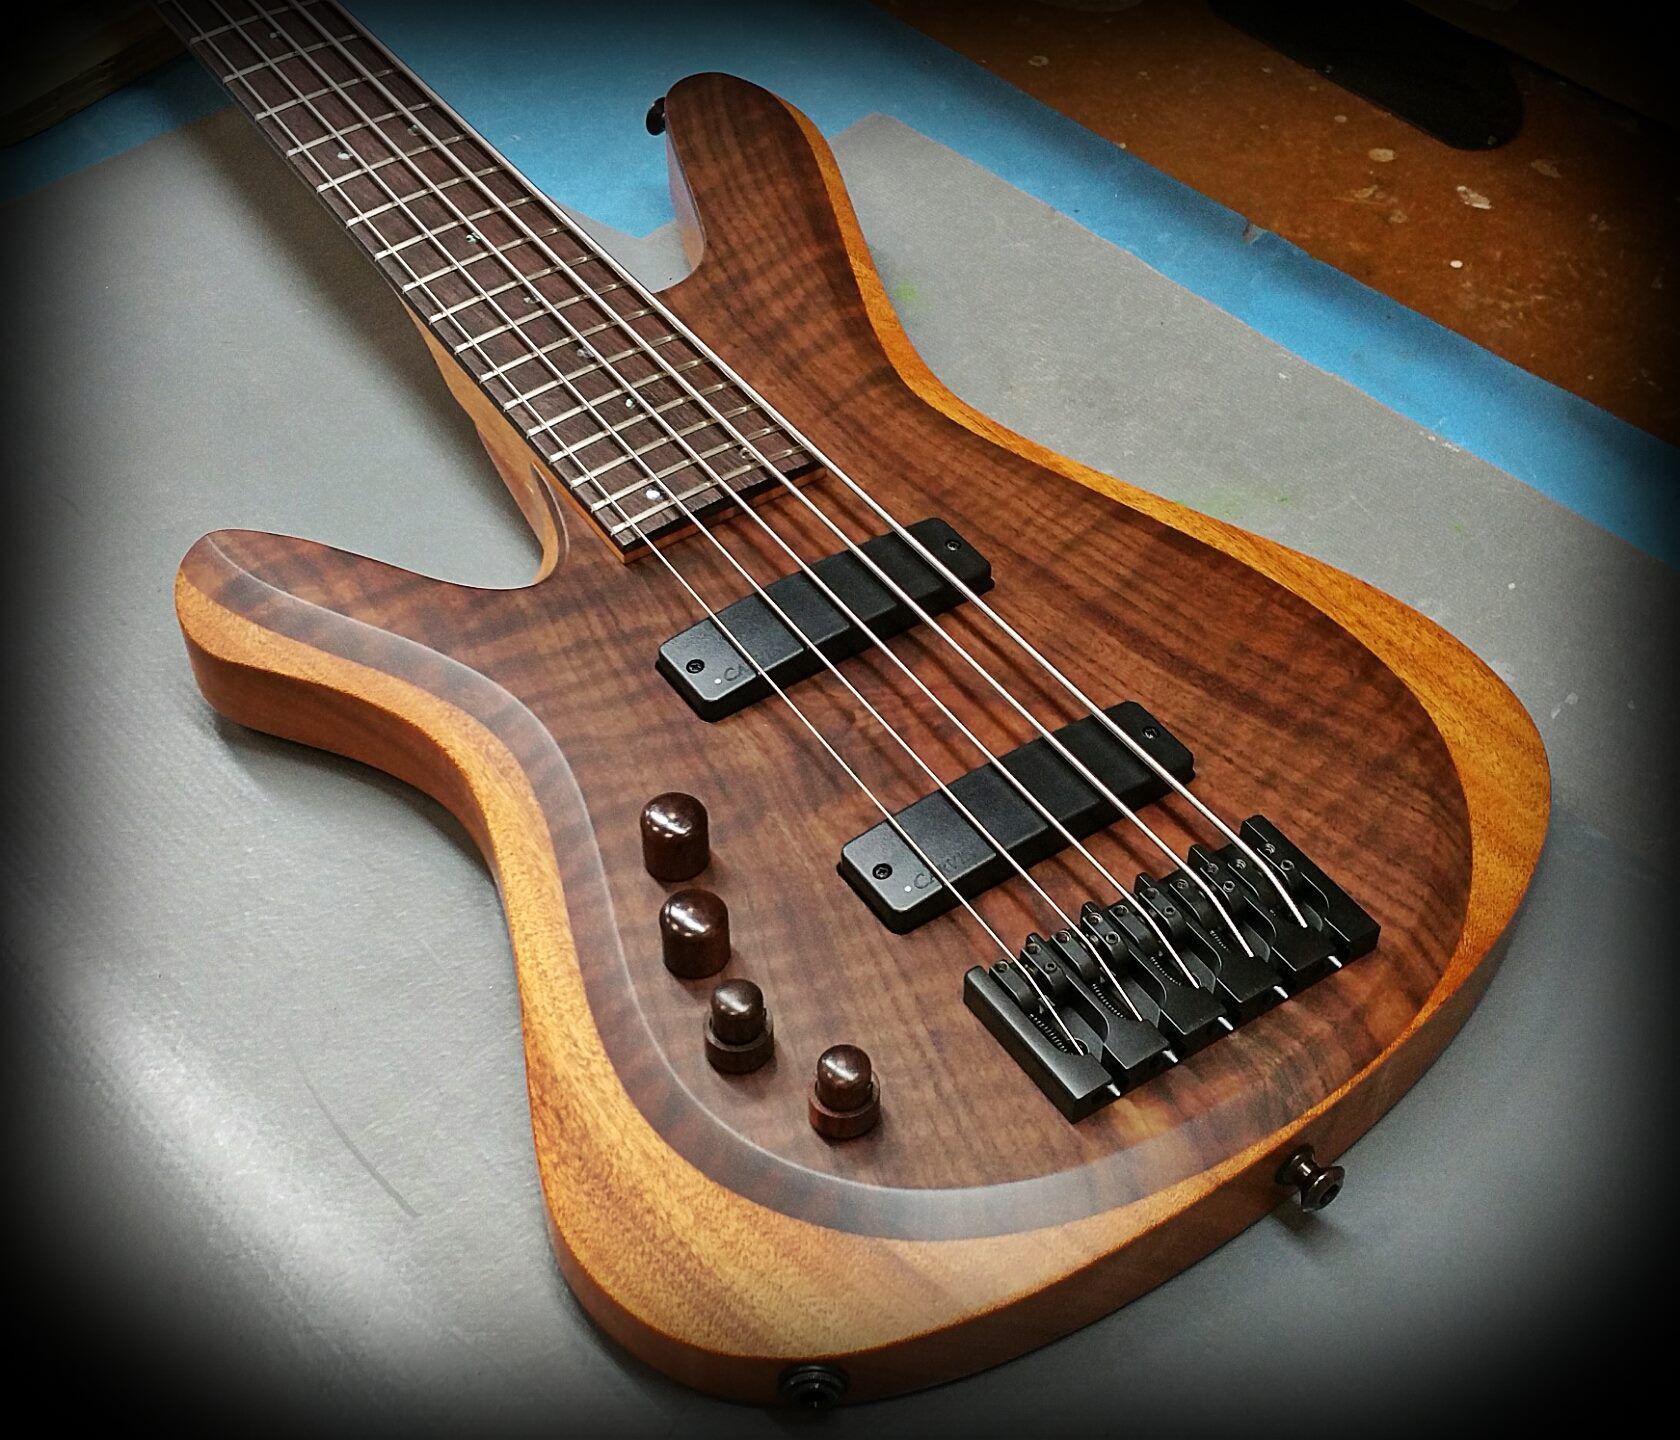 Kiesel Guitars Carvin Guitars  V59K lefty with figured claro walnut top on mahogany body in satin finish